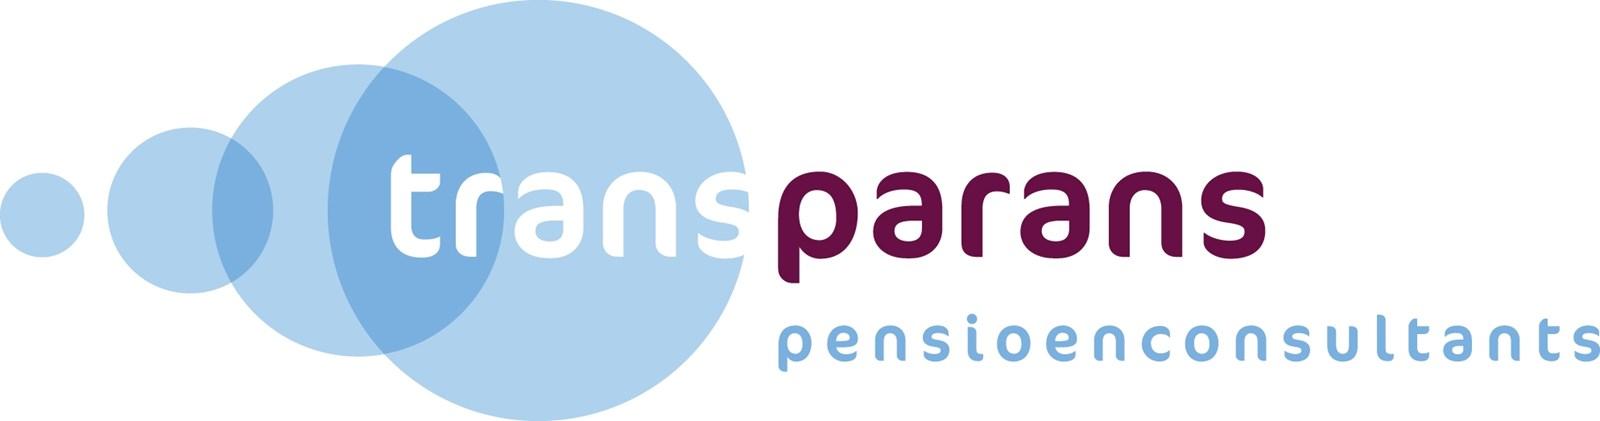 Logo van Transparans Pensioenconsultants